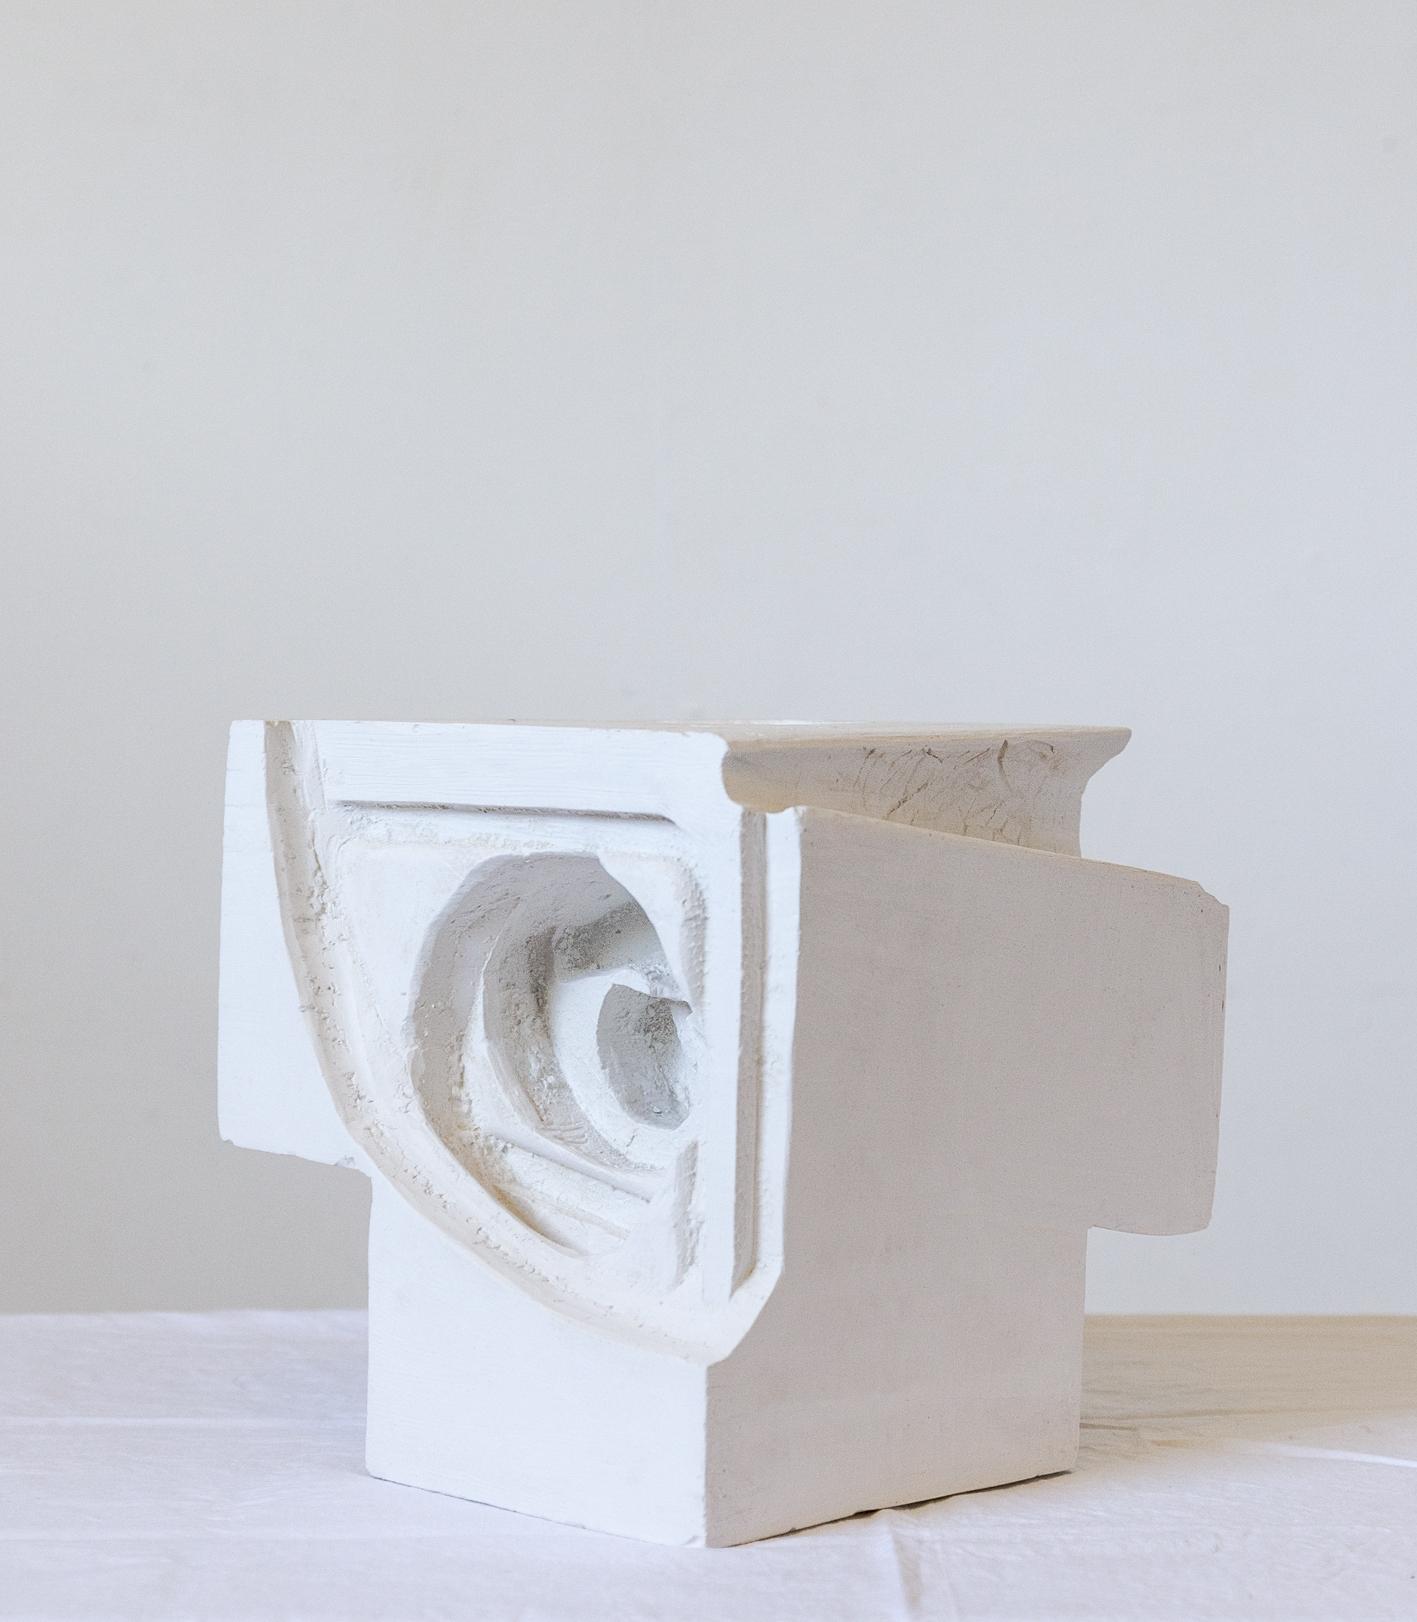 Randal-Arvilla-Negative-Space-I-sculpture